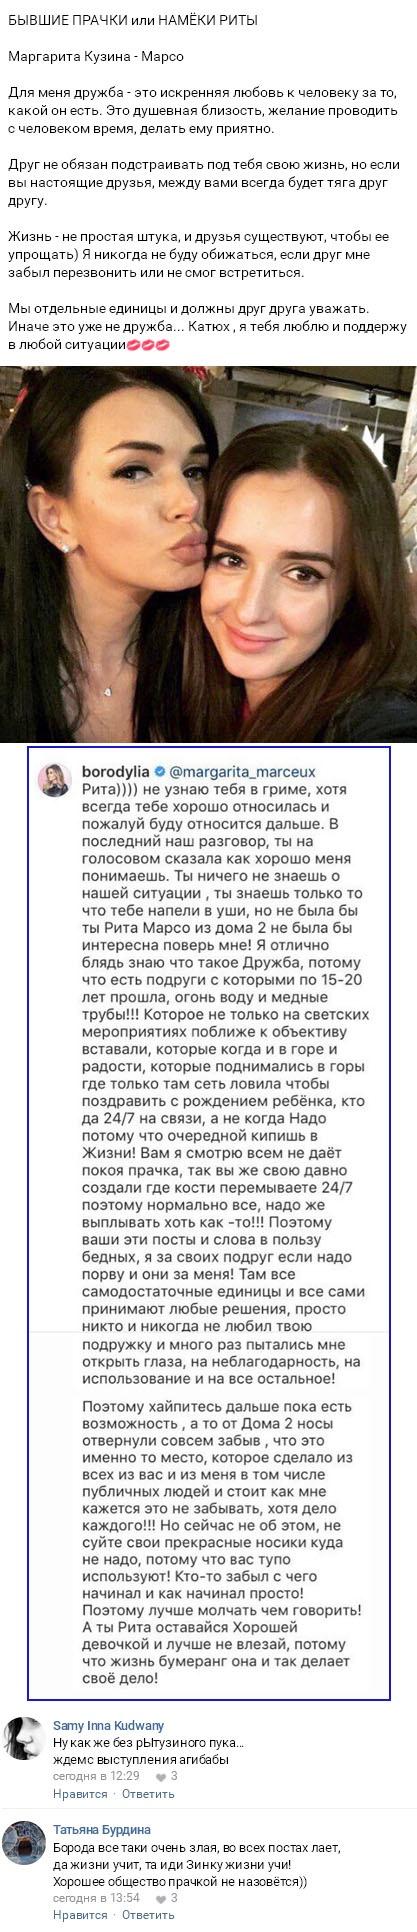 Ксения Бородина набросилась на Маргариту Марсо из-за Кати Жужи